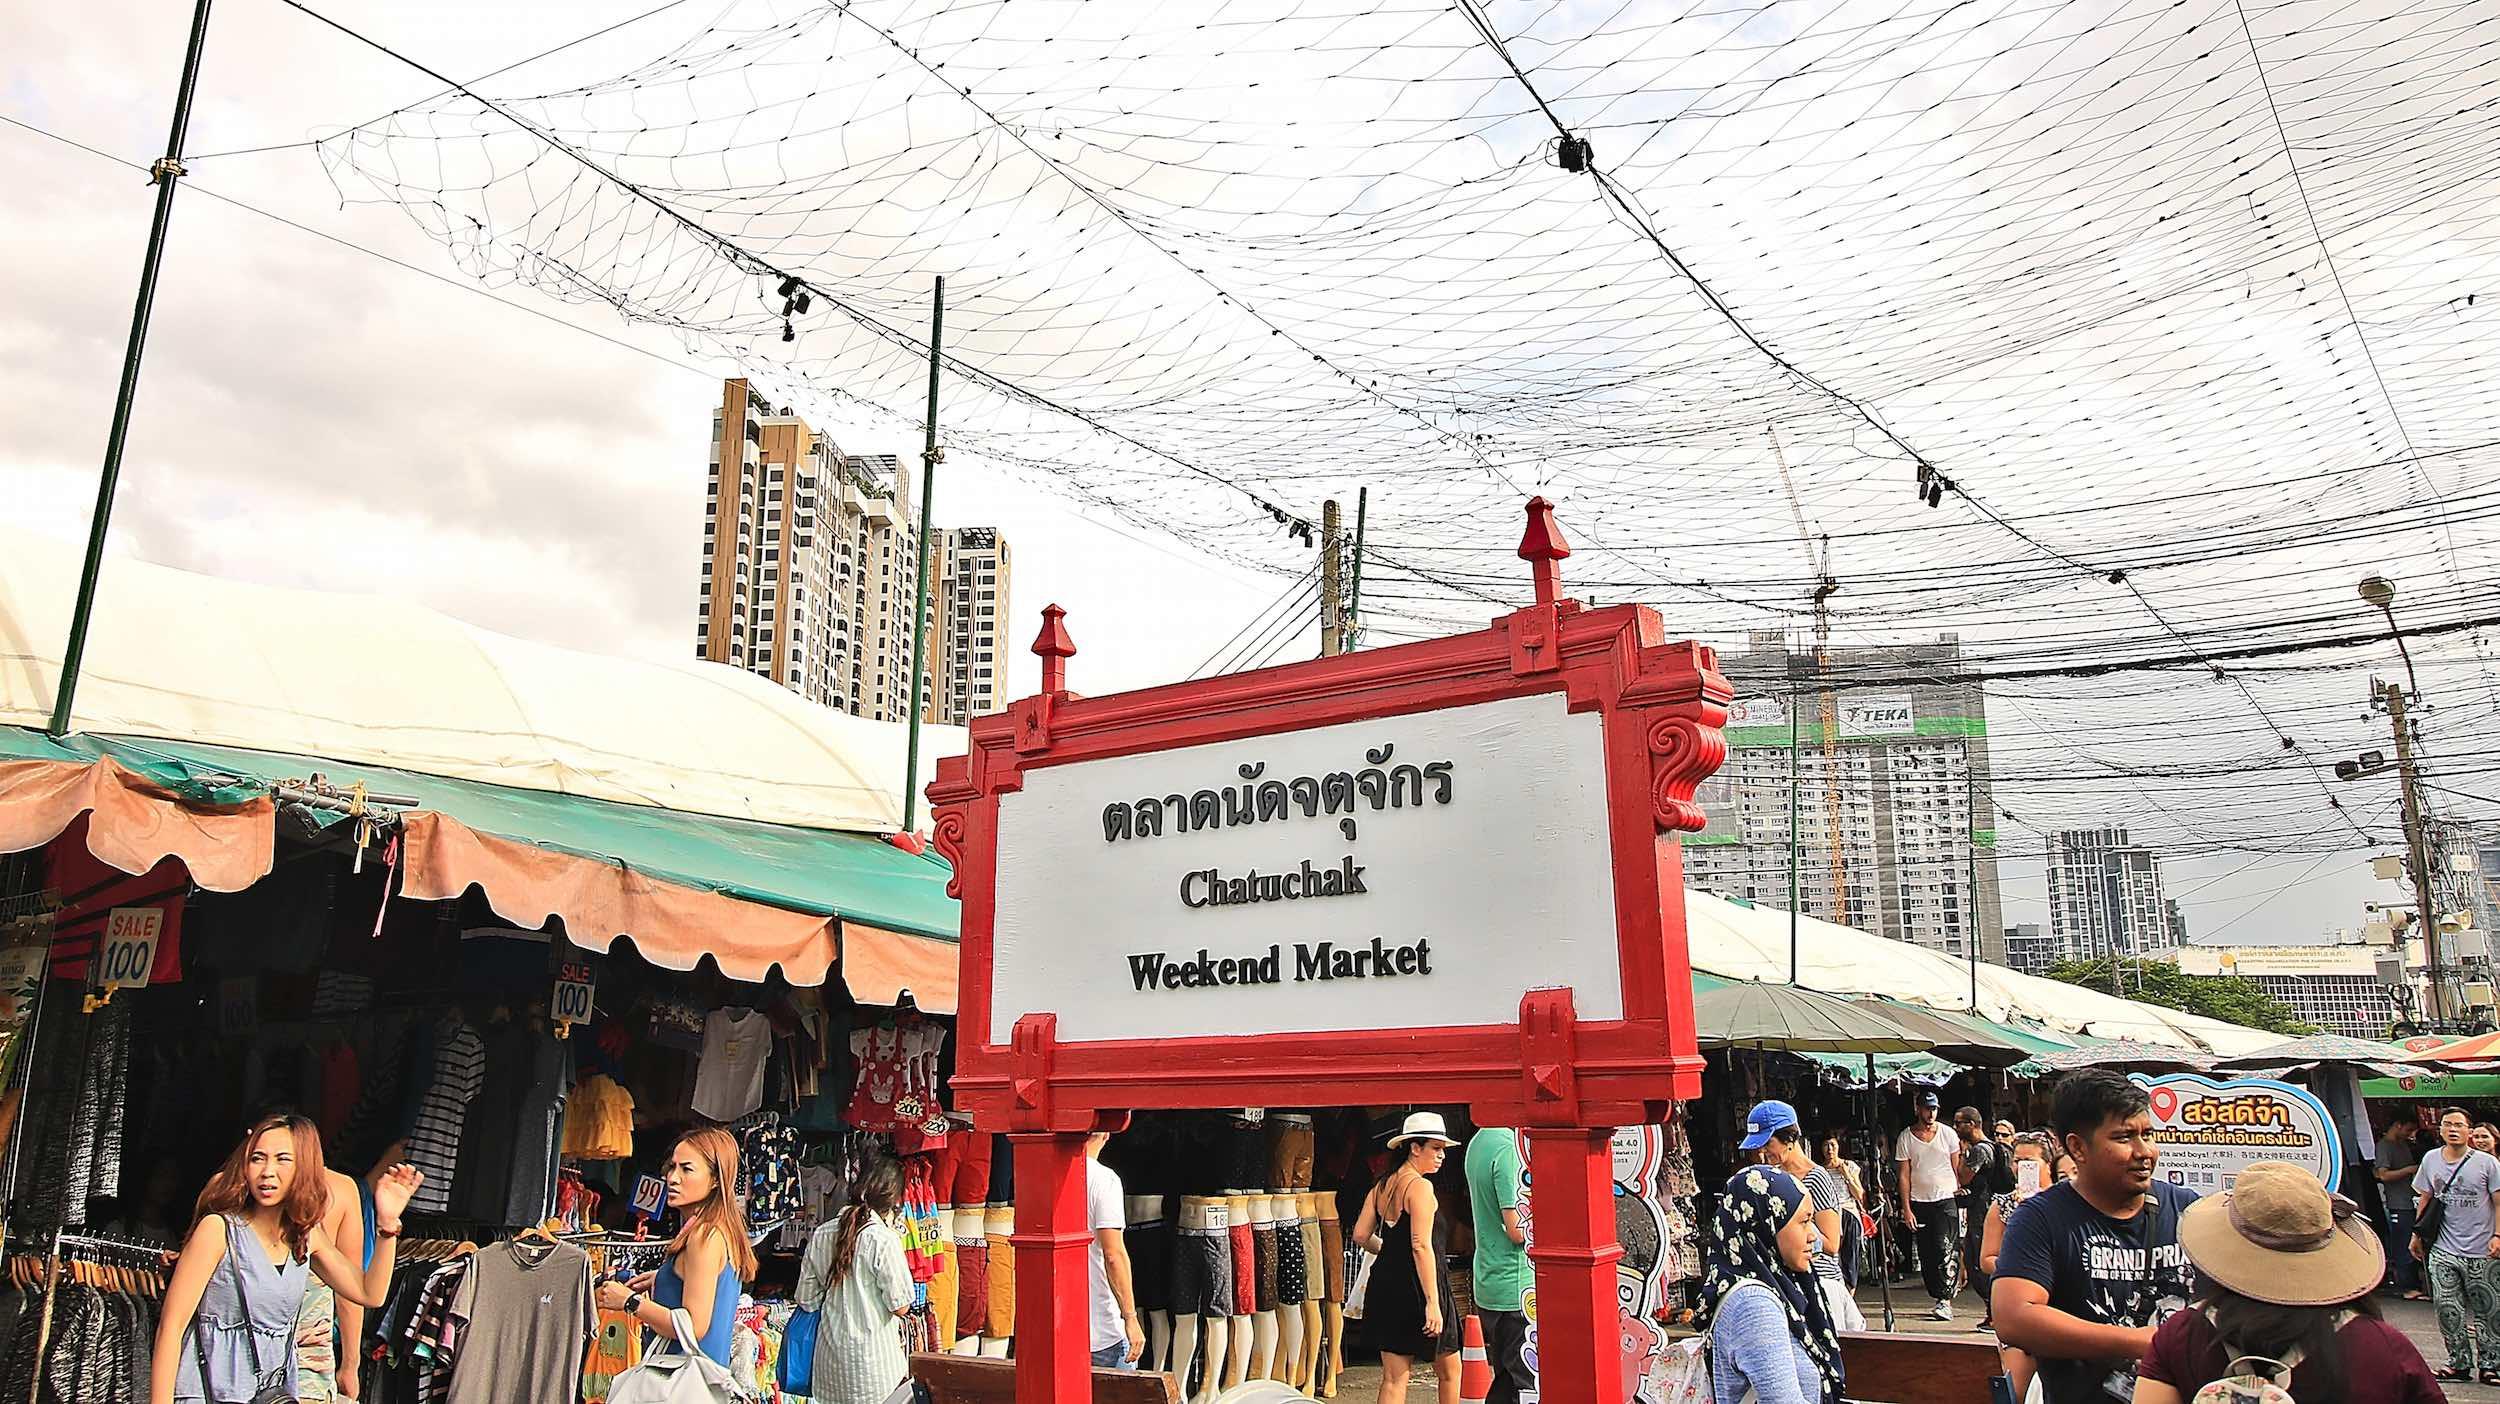 Chatuchak_Weekend_Market_Bangkok_Sign_Post.jpg